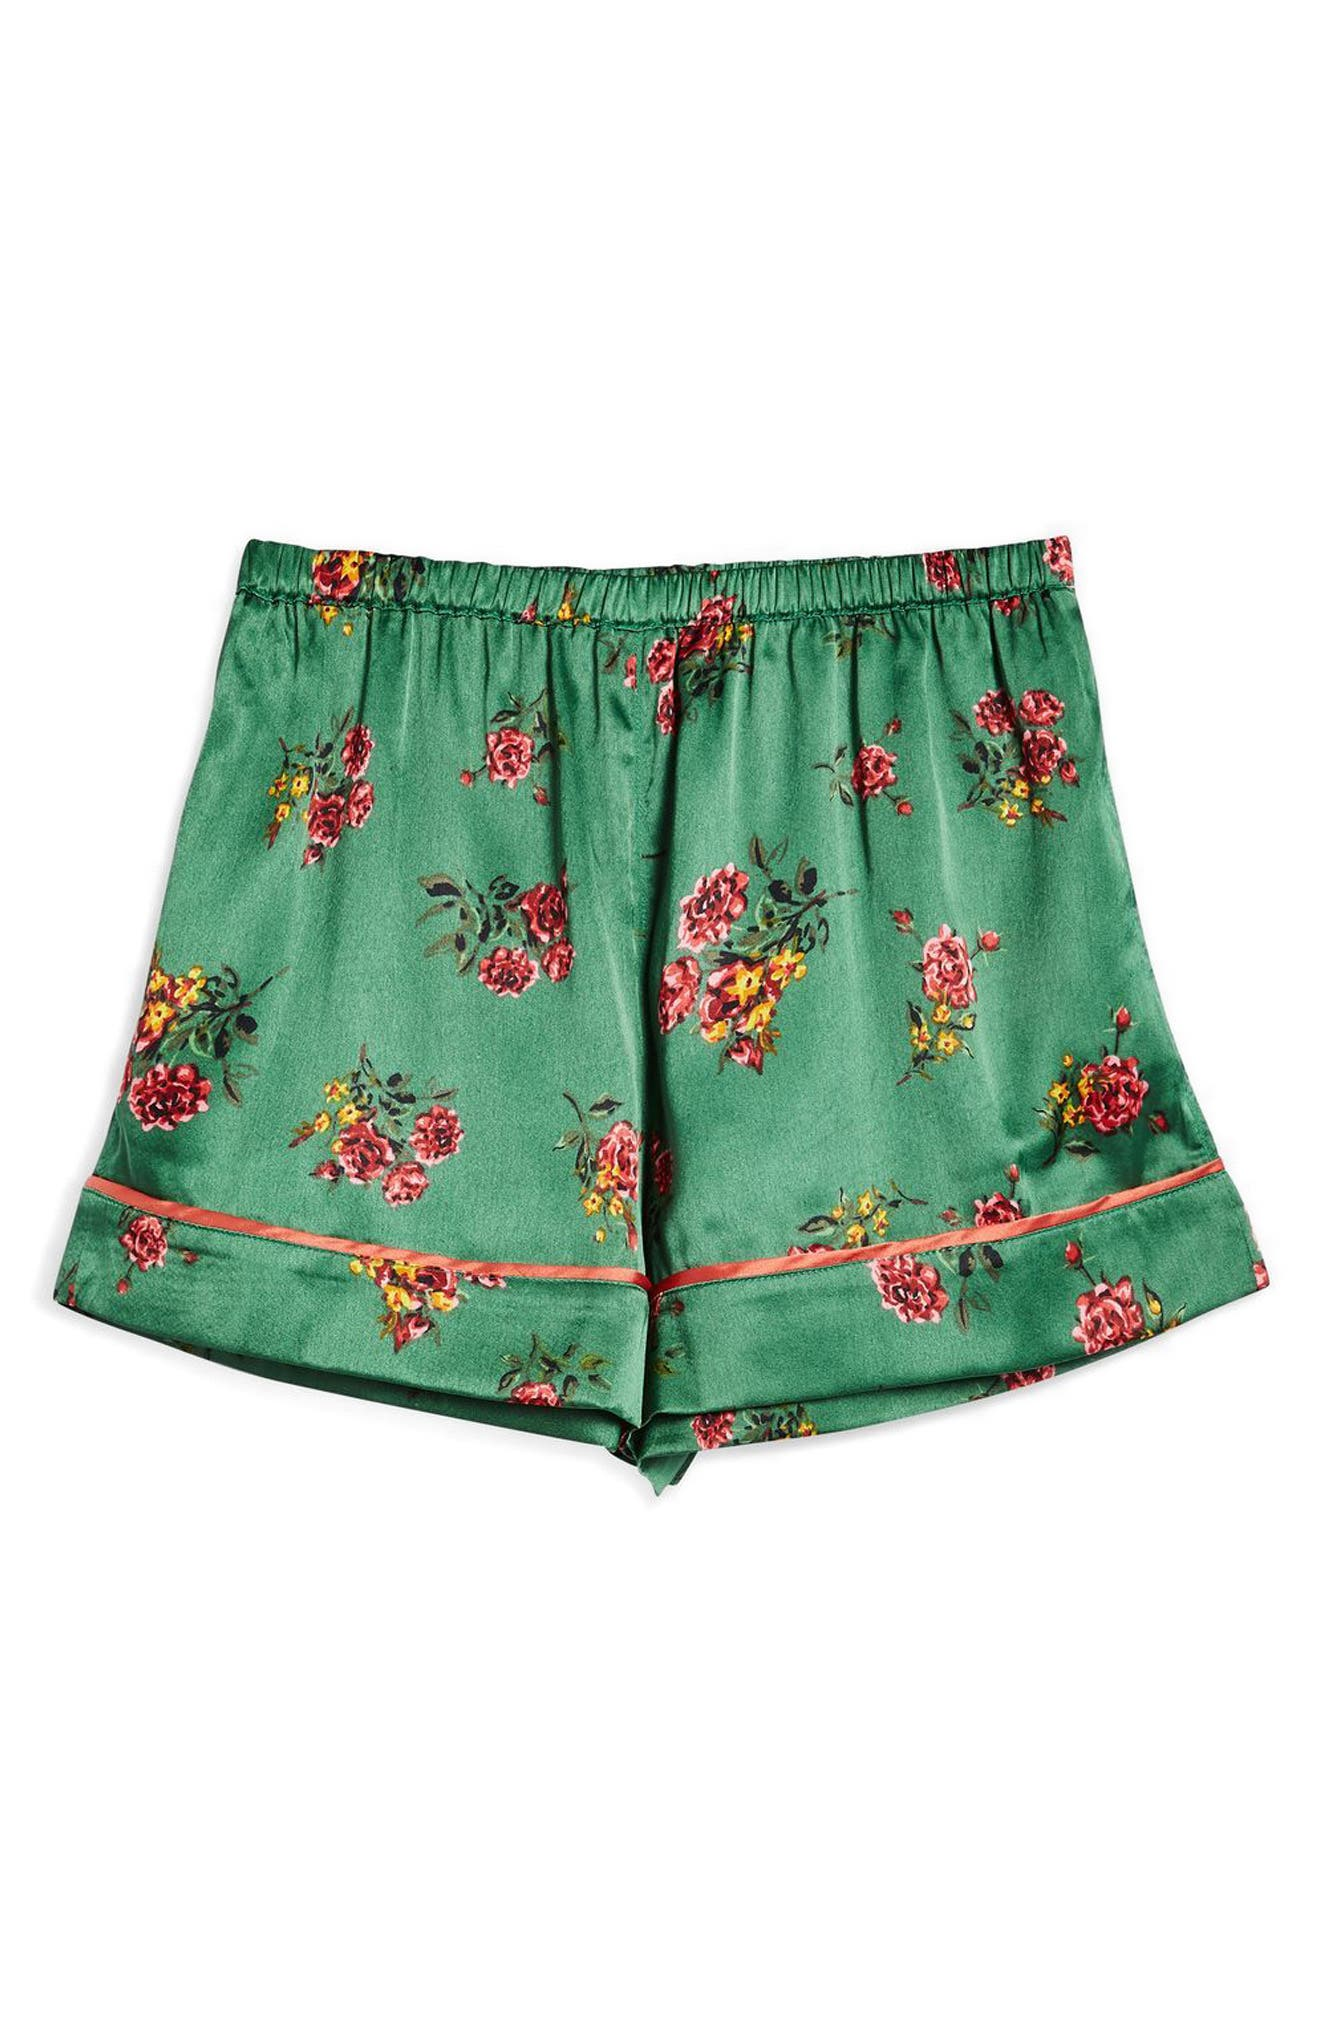 Floral Print Pajama Shorts,                             Alternate thumbnail 3, color,                             Bright Green Multi